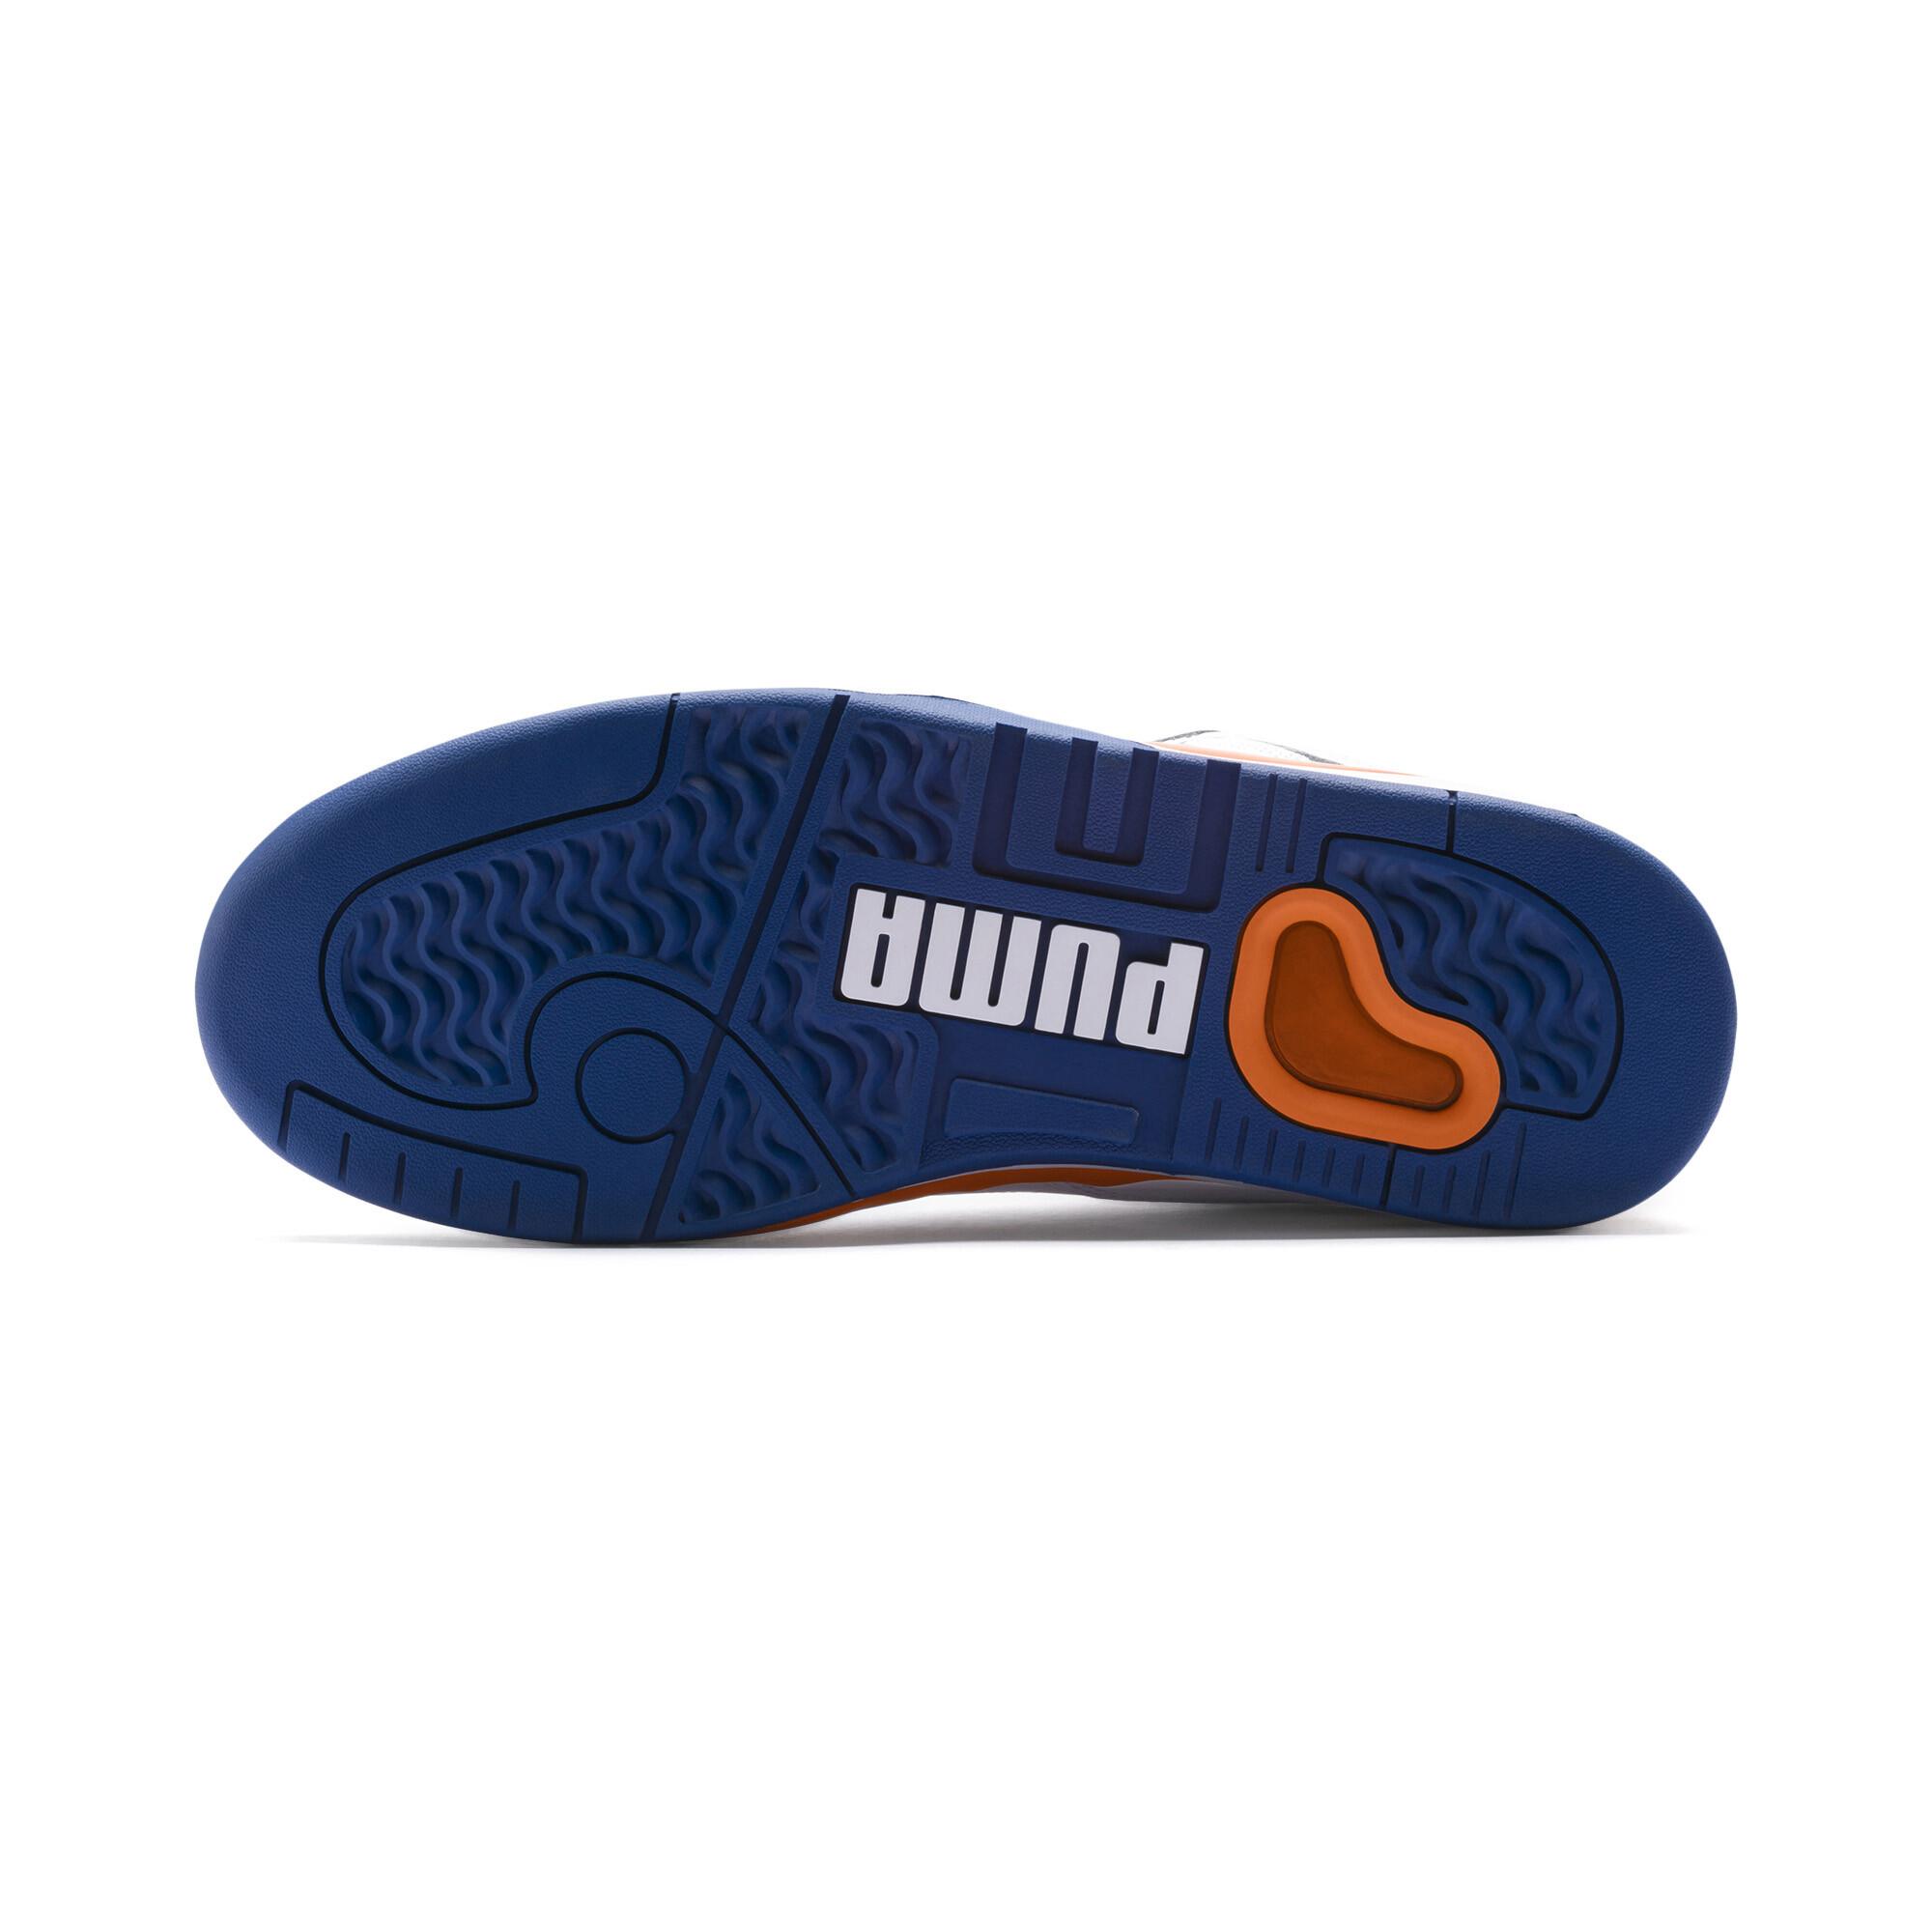 Indexbild 26 - PUMA Palace Guard Sneaker Unisex Schuhe Sport Classics Neu